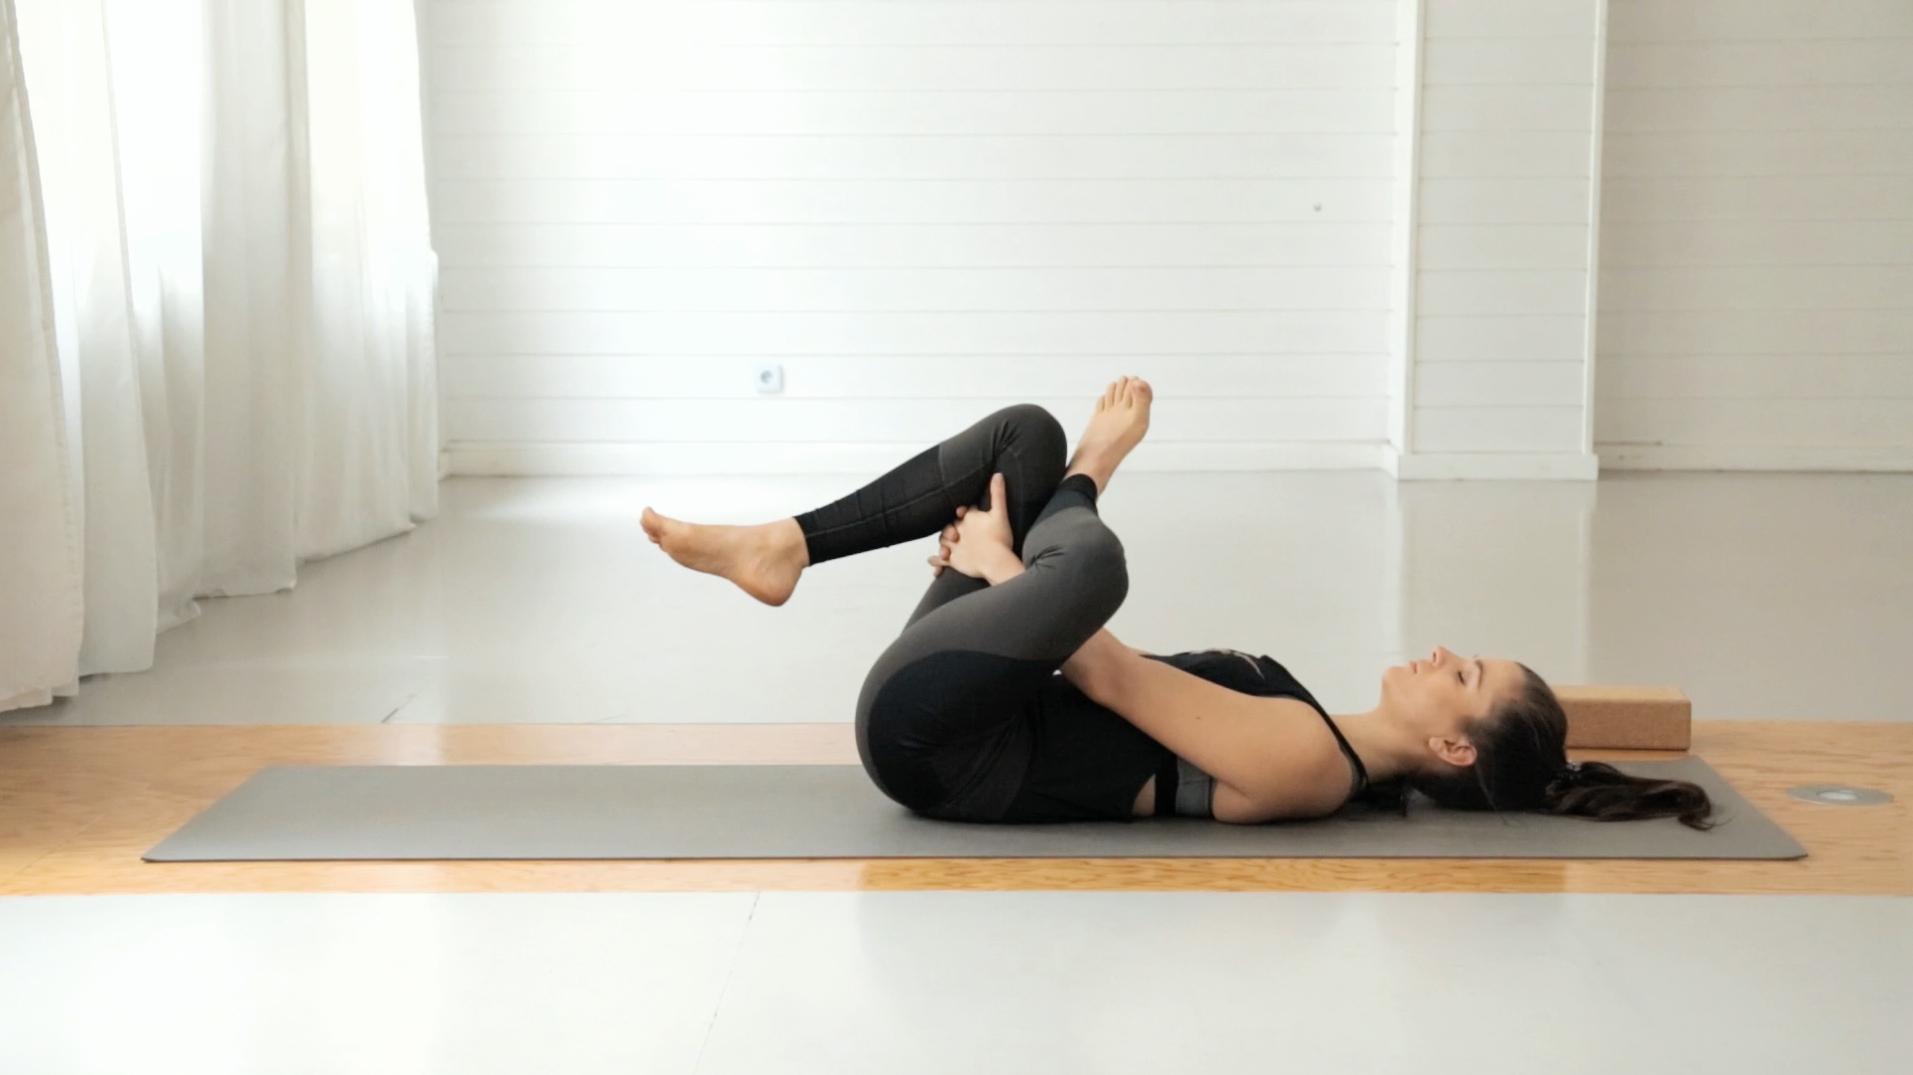 beine-po-booty-yoga-mady-morrison-13